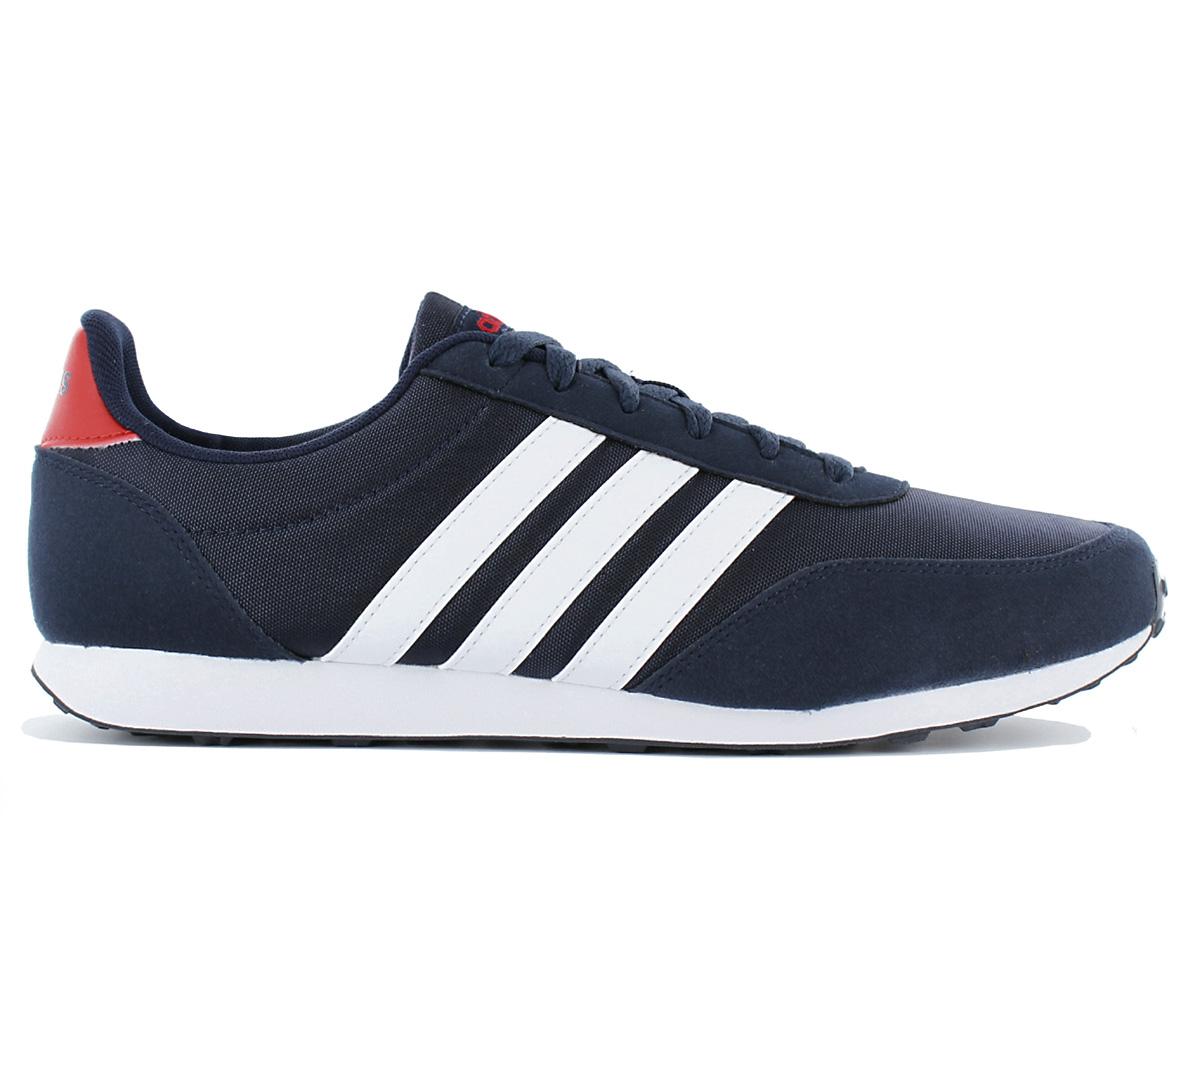 NEU adidas Racer V 2.0 Herren Schuhe Navy-Blau CG5706 SALE